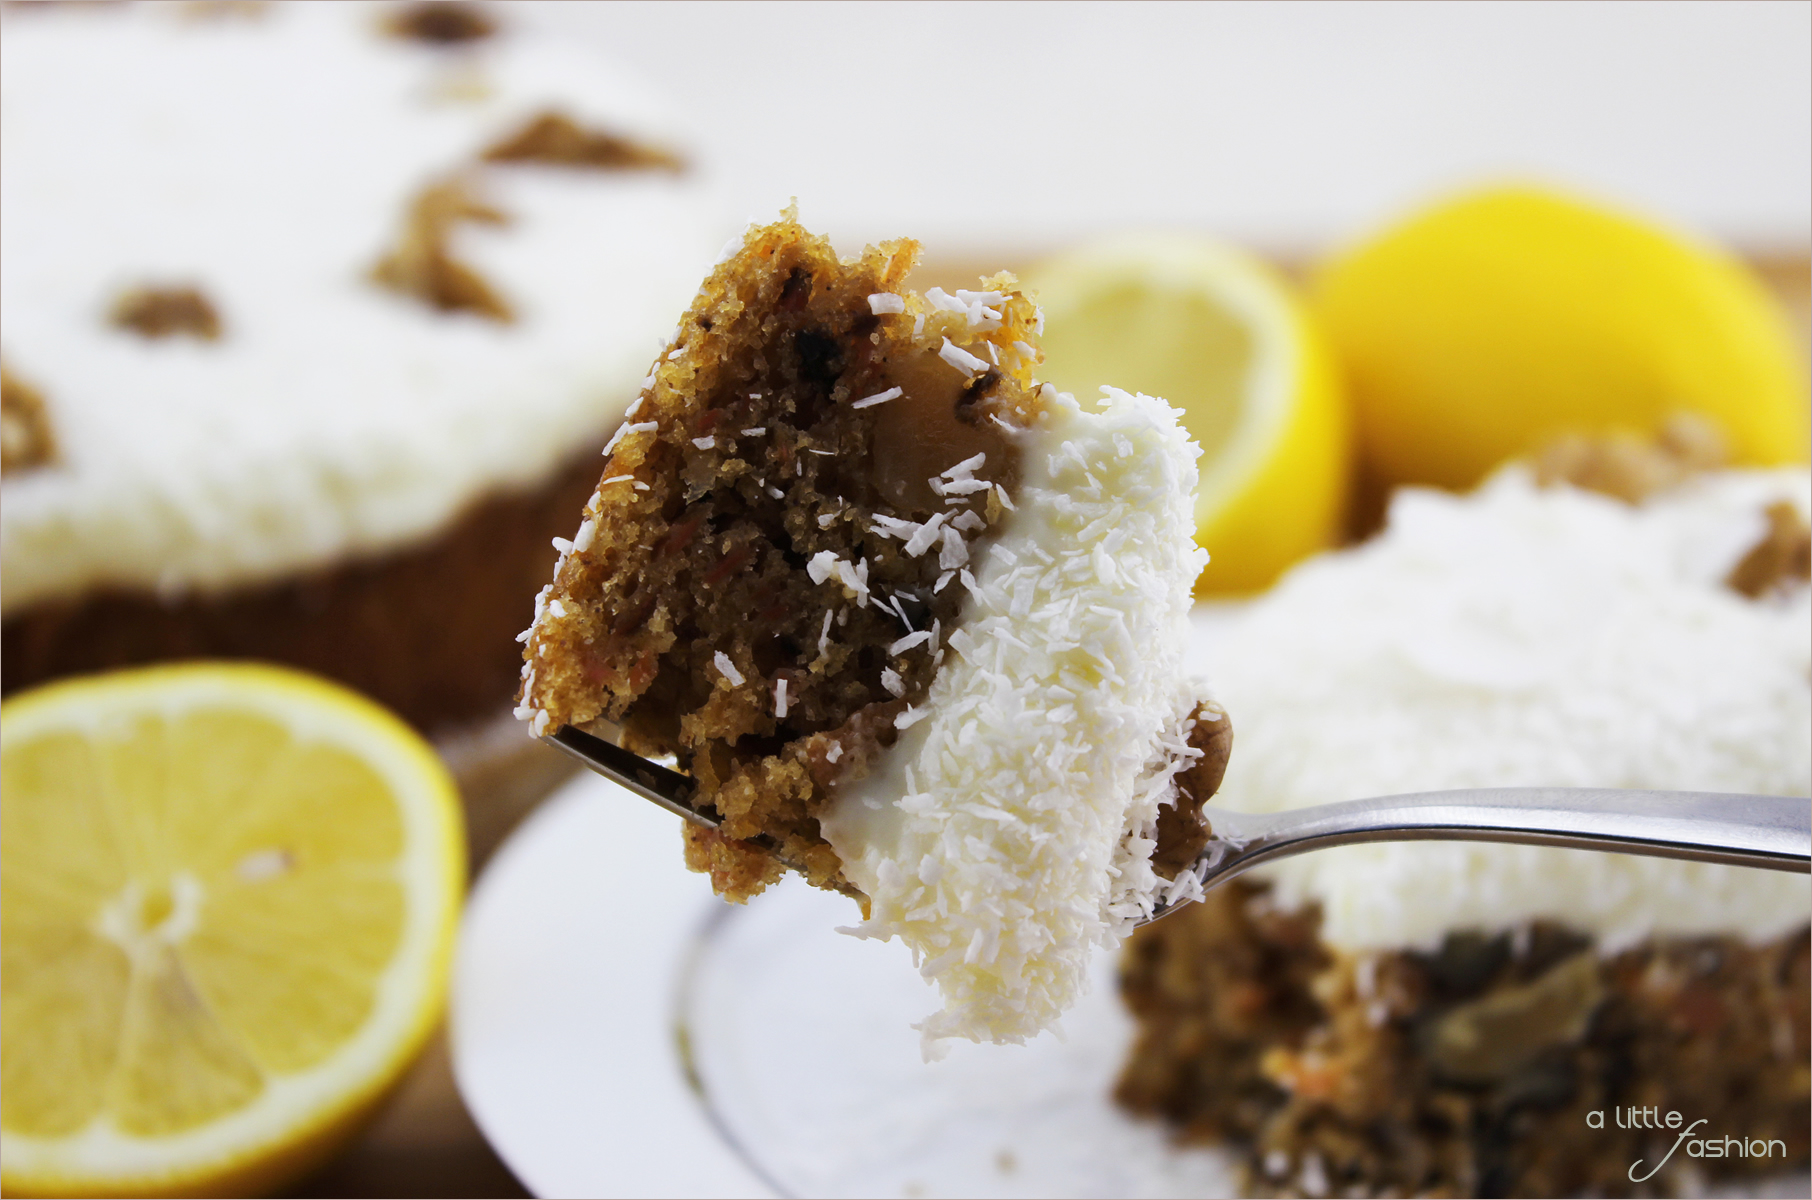 Möhren-Walnuss-Torte mit Zitronentopping   A Little Fashion   https://www.filizity.com/food/moehren-walnuss-torte-mit-zitronentopping